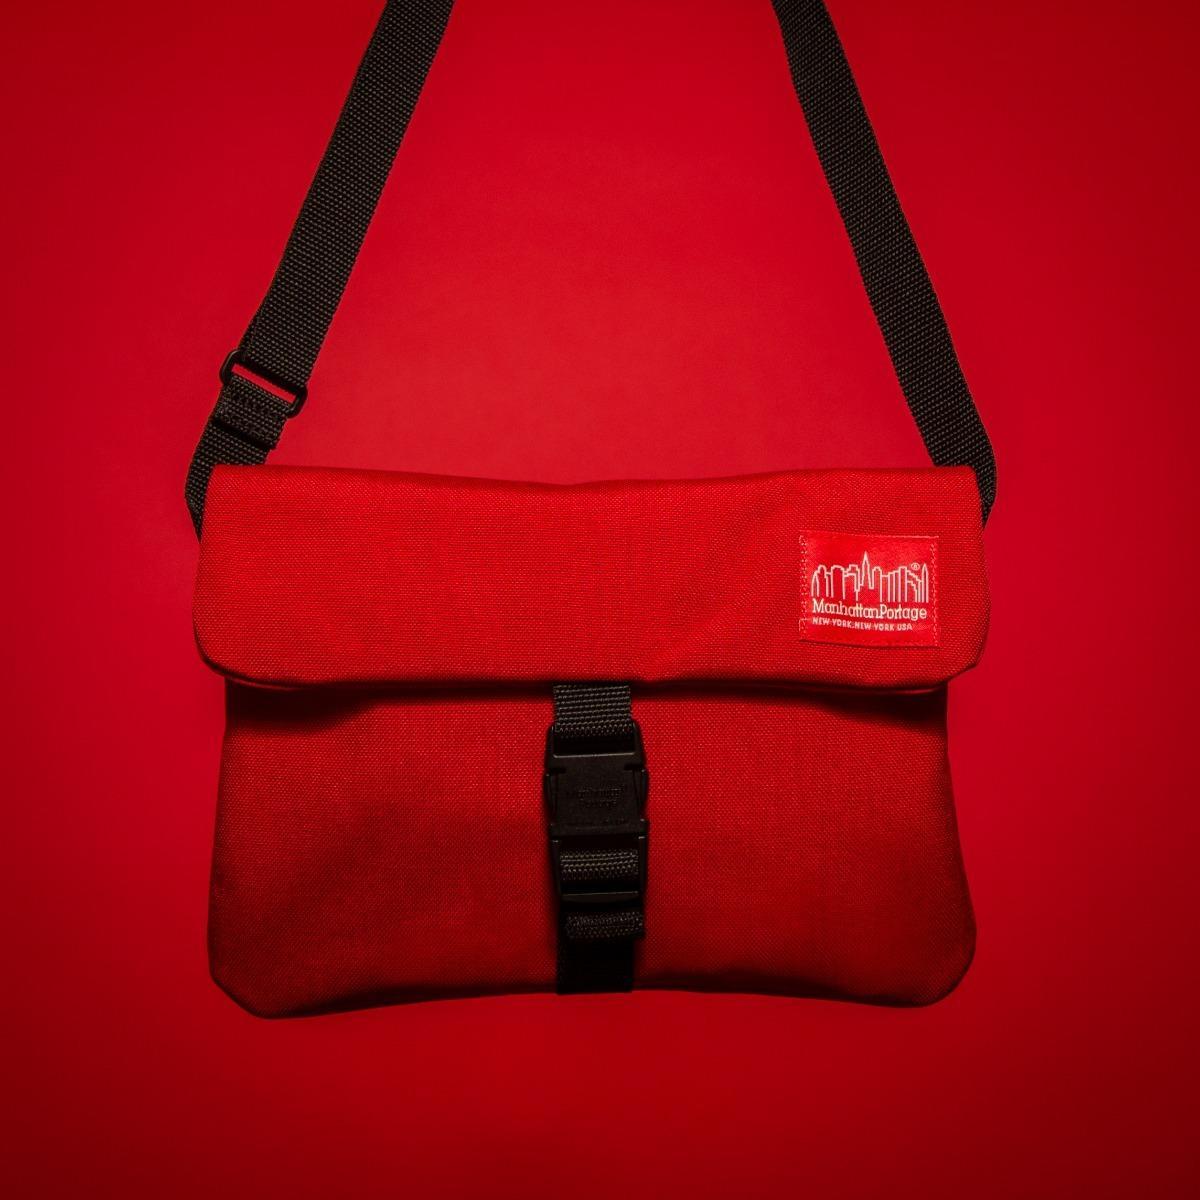 f76b479cb4c Manhattan Portage - offers messenger bags, shoulder bags, laptop ...